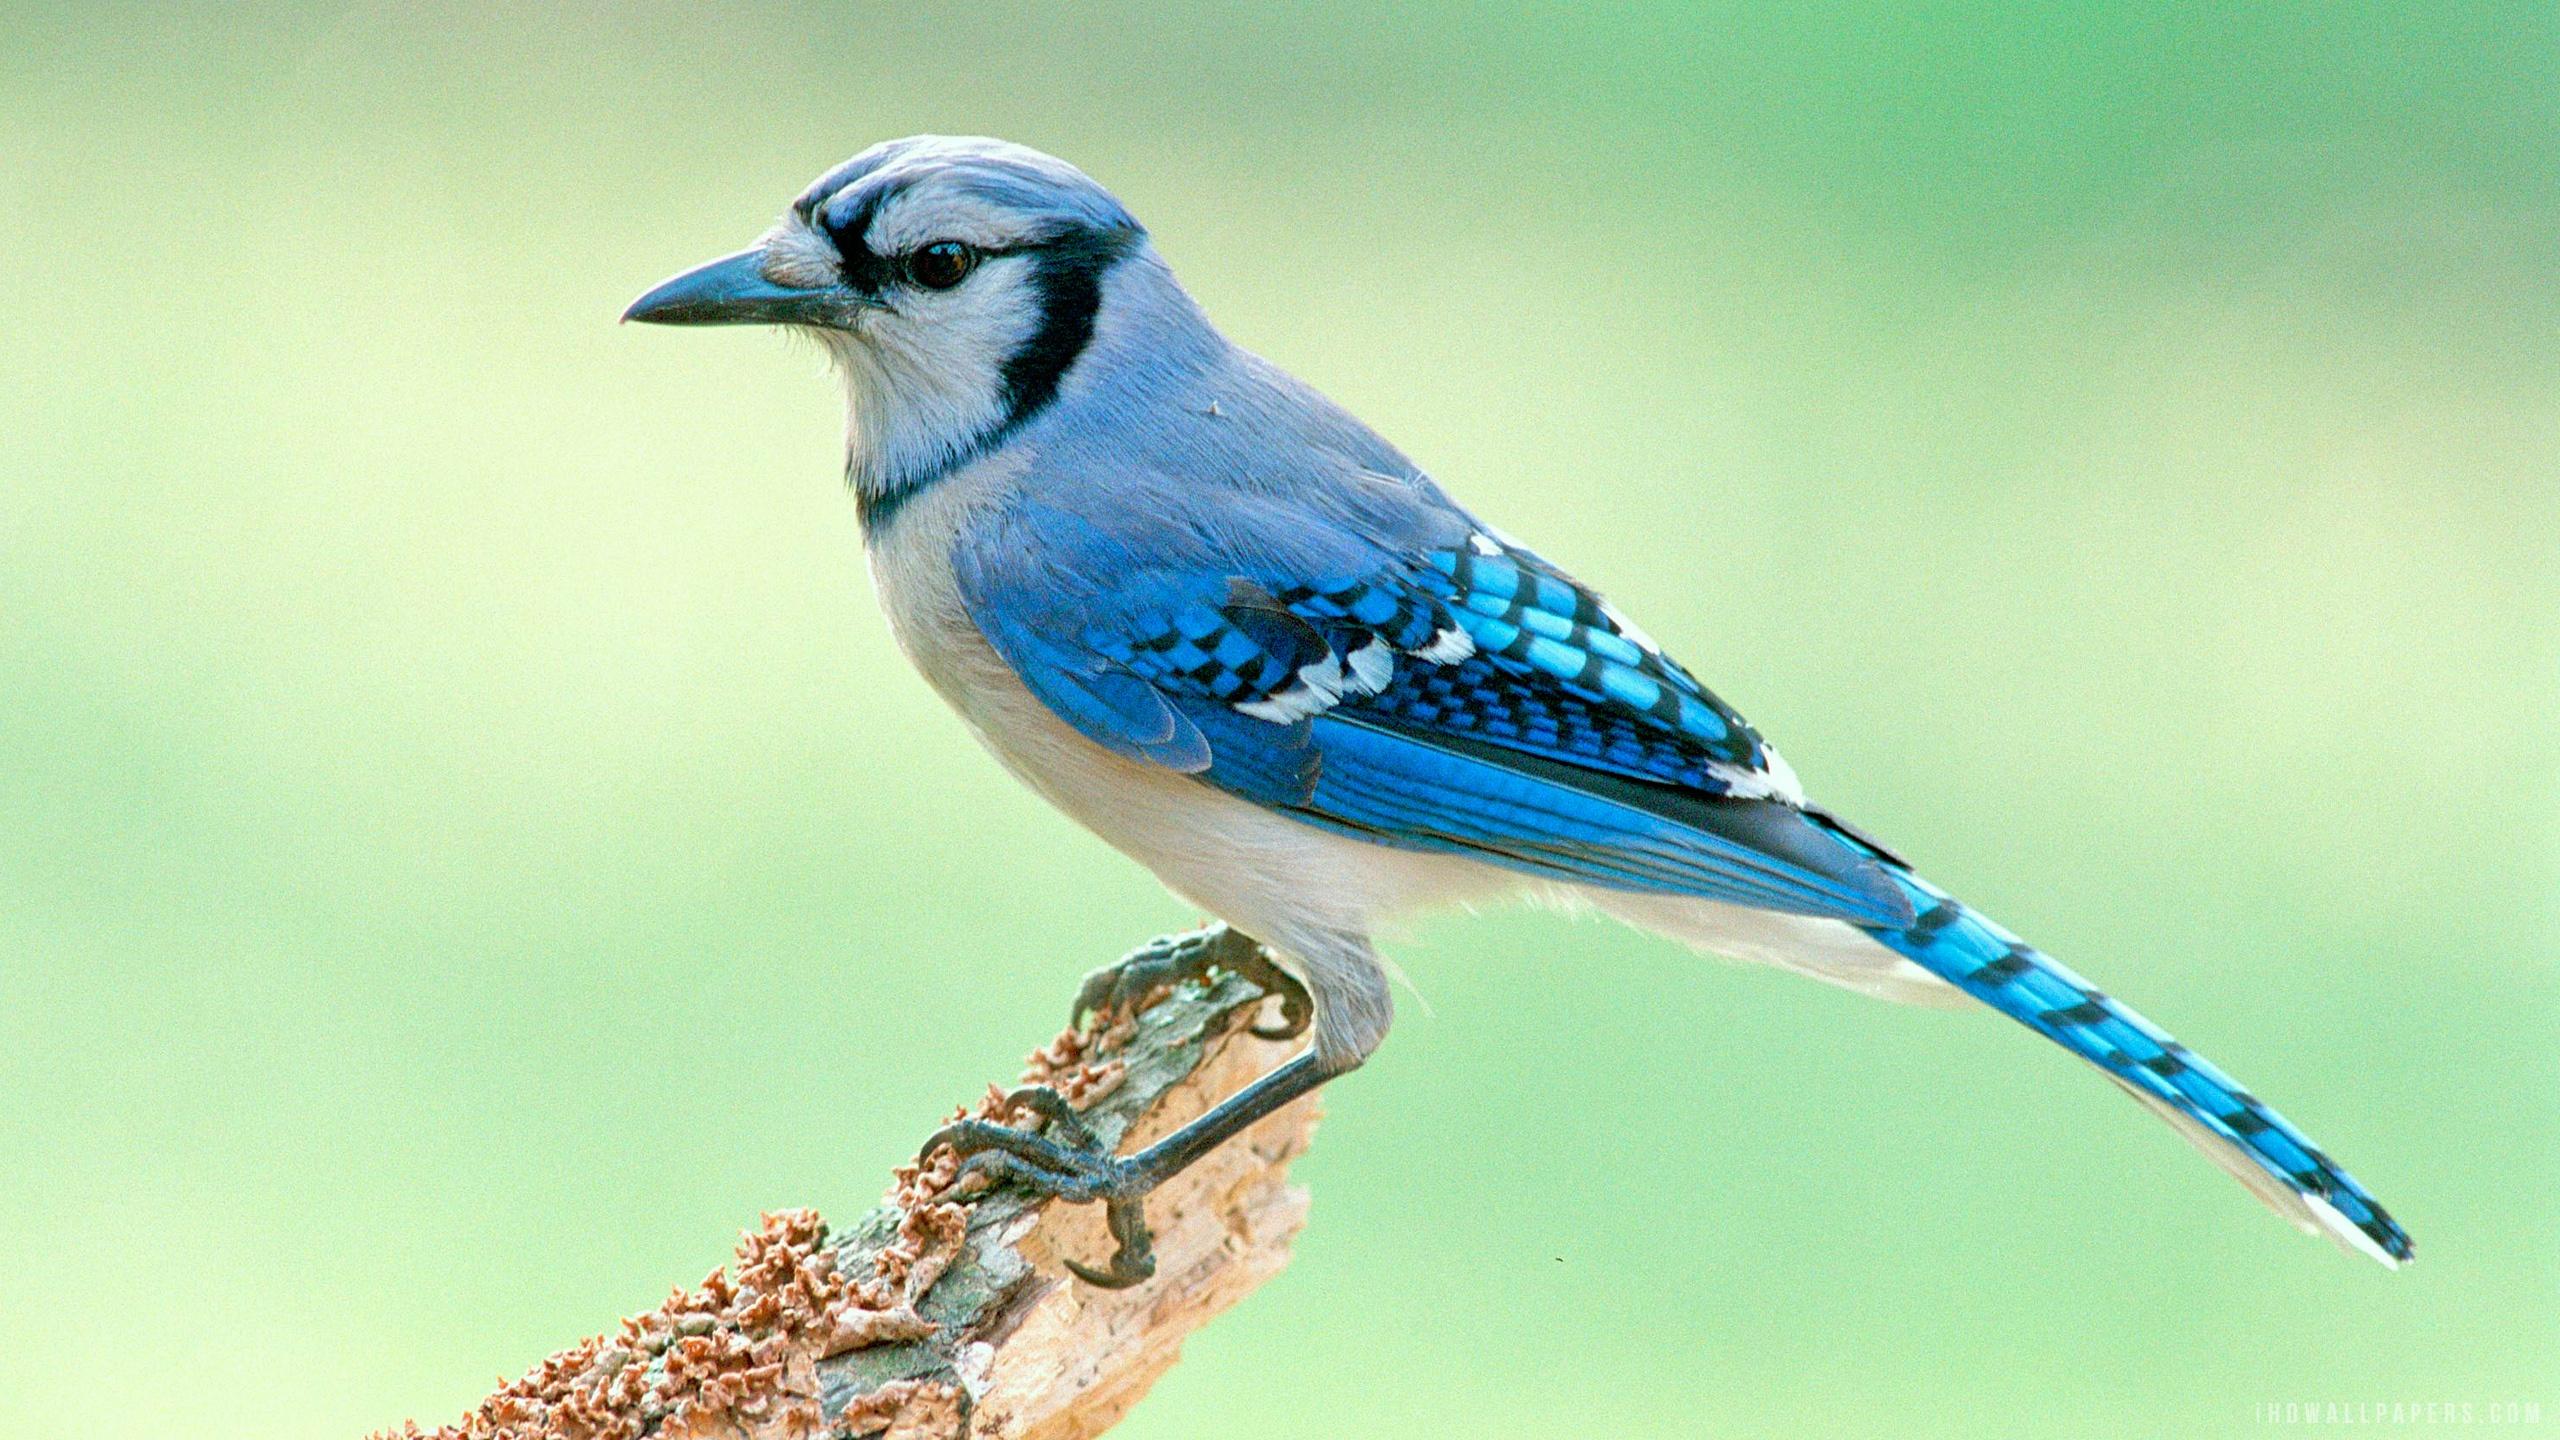 Blue Jay Bird HD Wallpaper   iHD Wallpapers 2560x1440